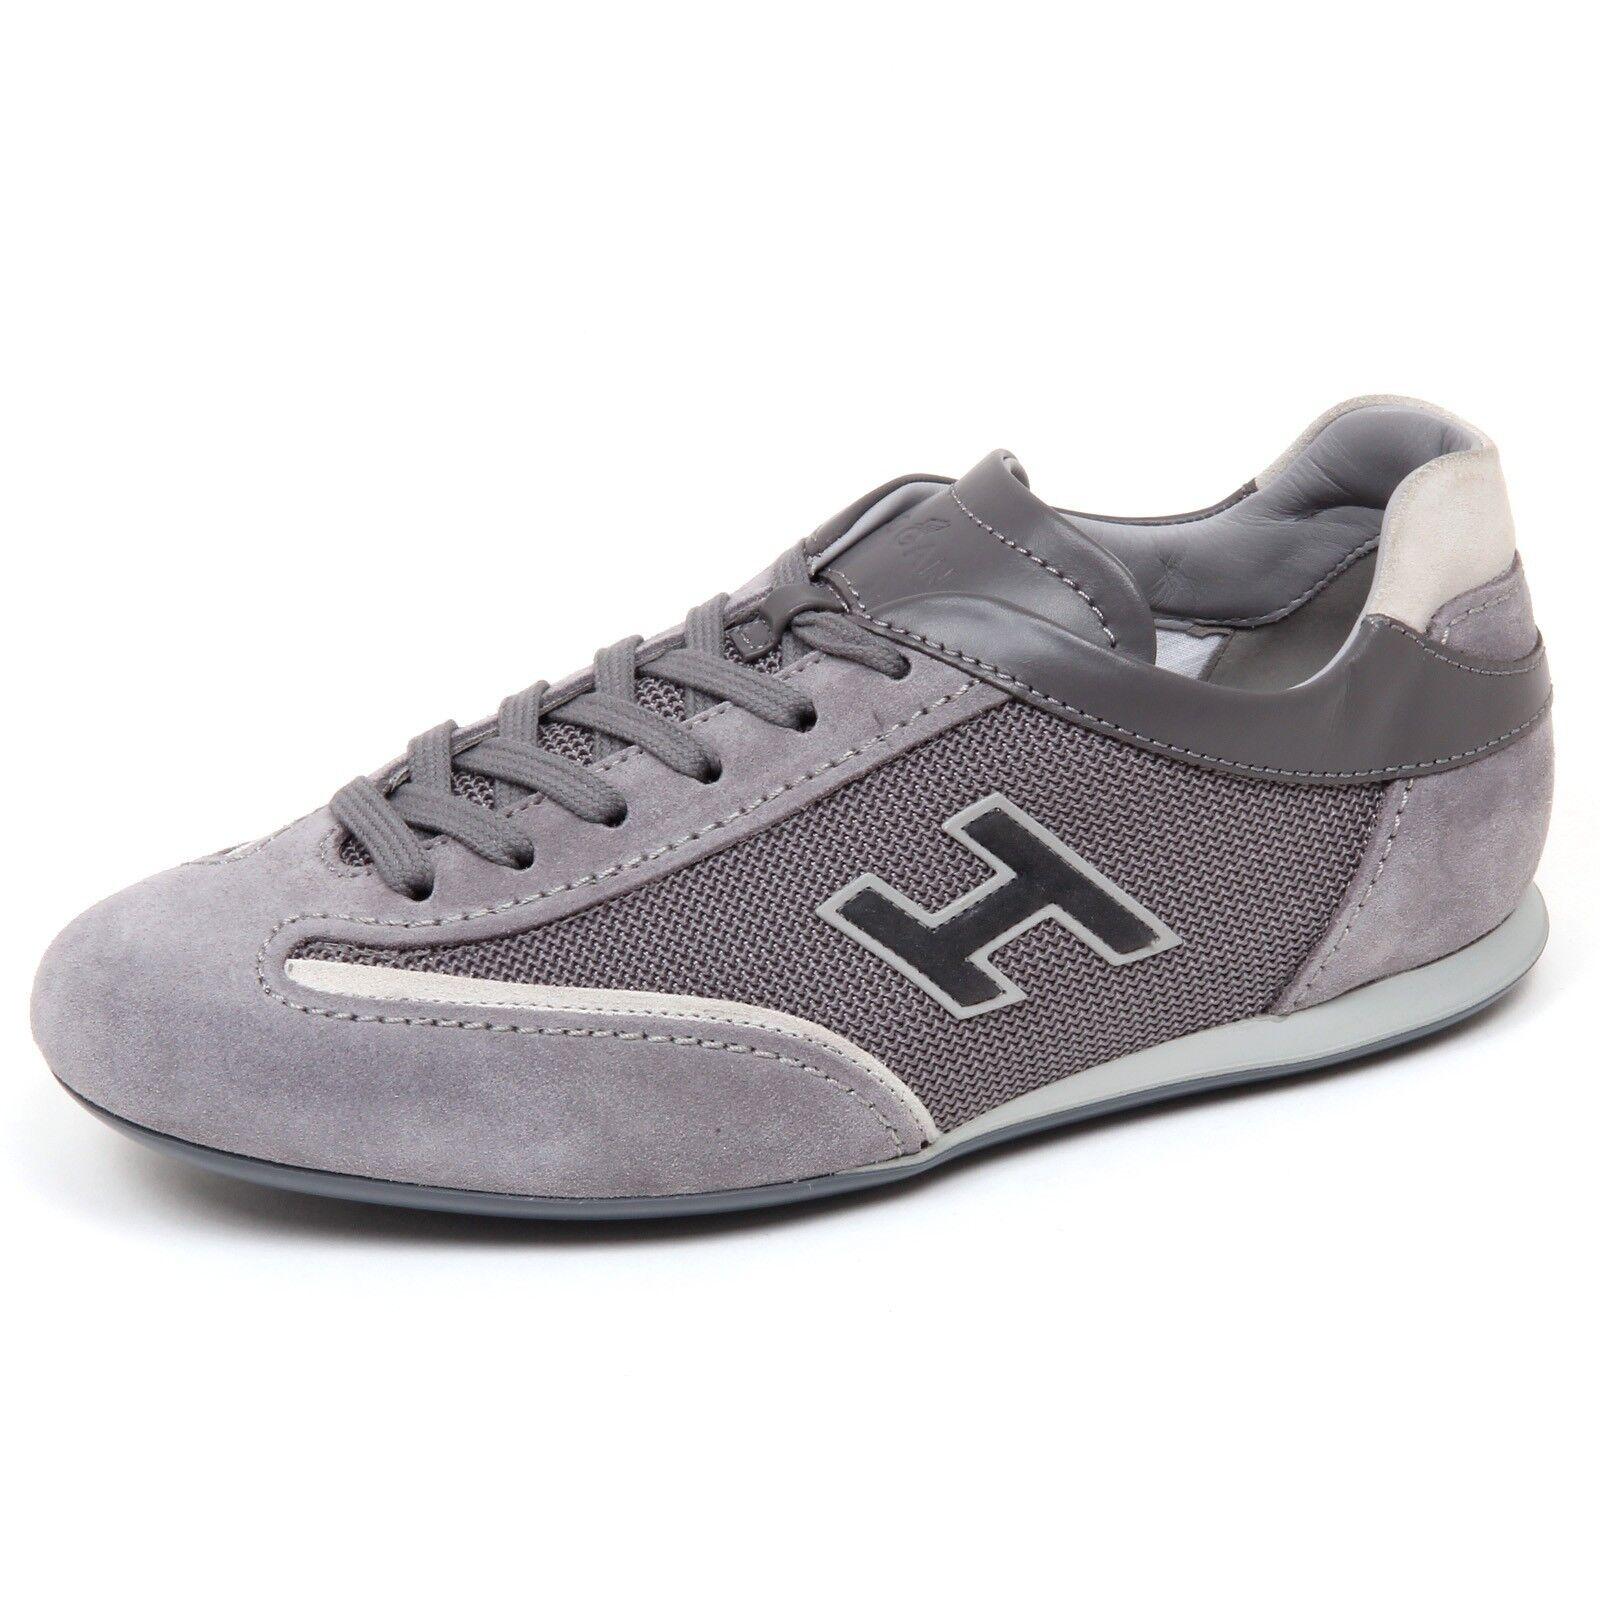 E9070 sneaker uomo grey HOGAN OLYMPIA scarpe slash H flock shoe man